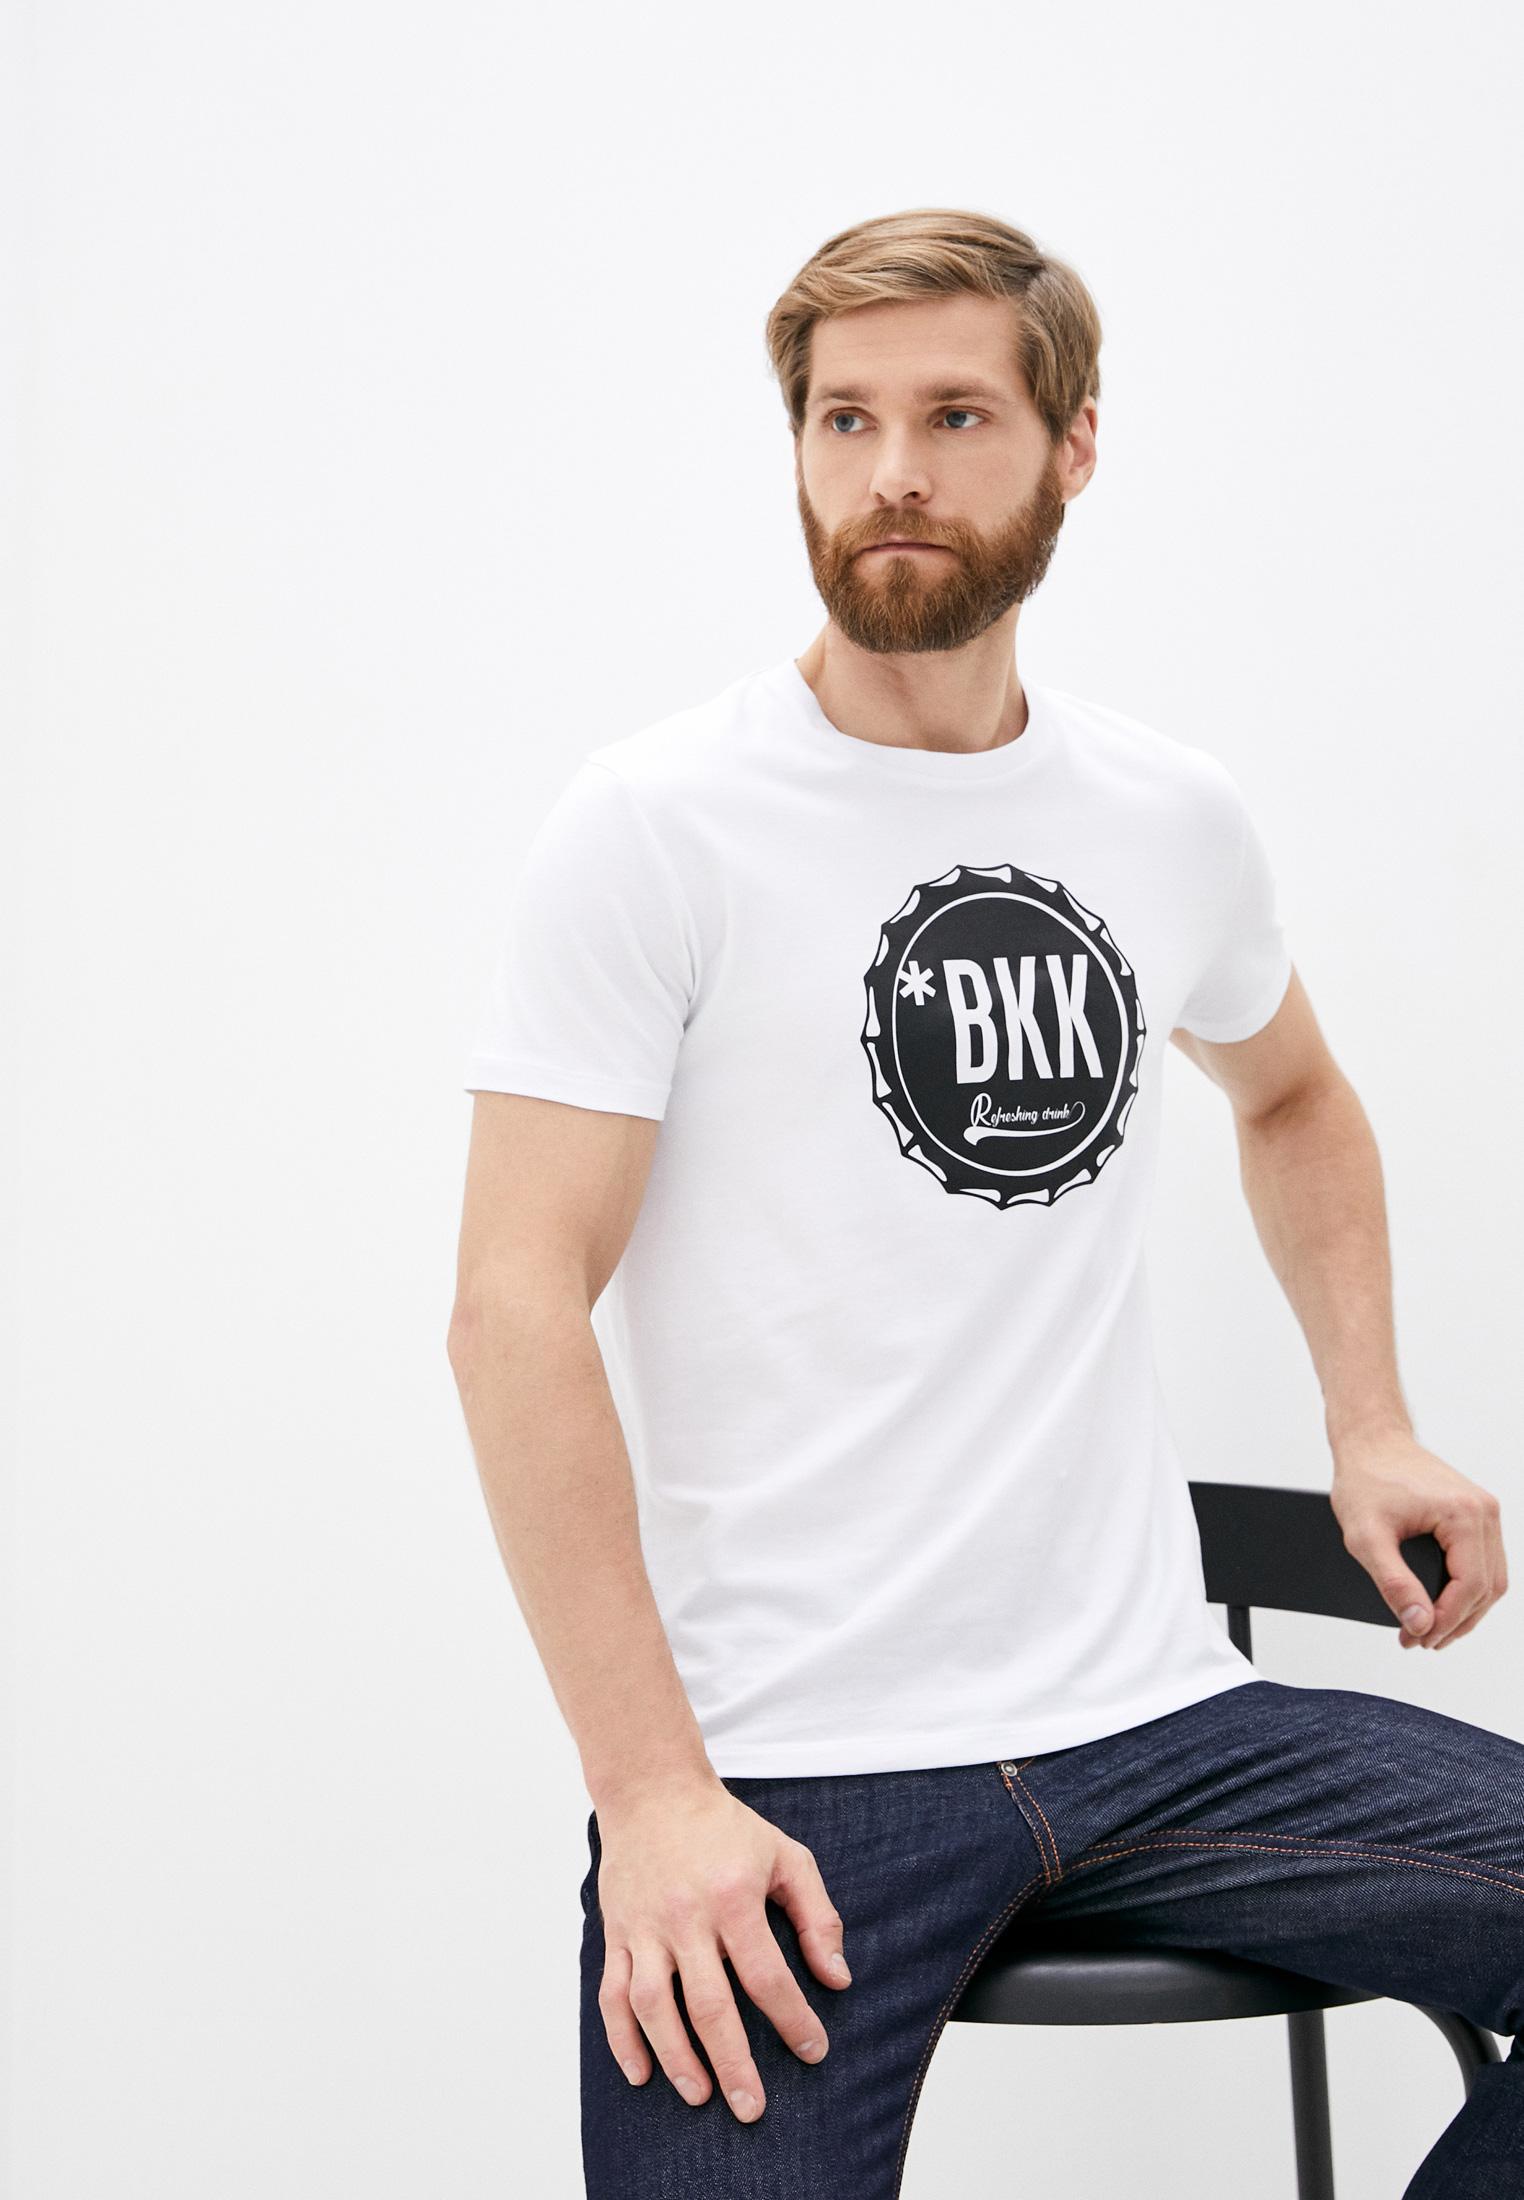 Мужская футболка Bikkembergs (Биккембергс) C 7 021 9R E 1814